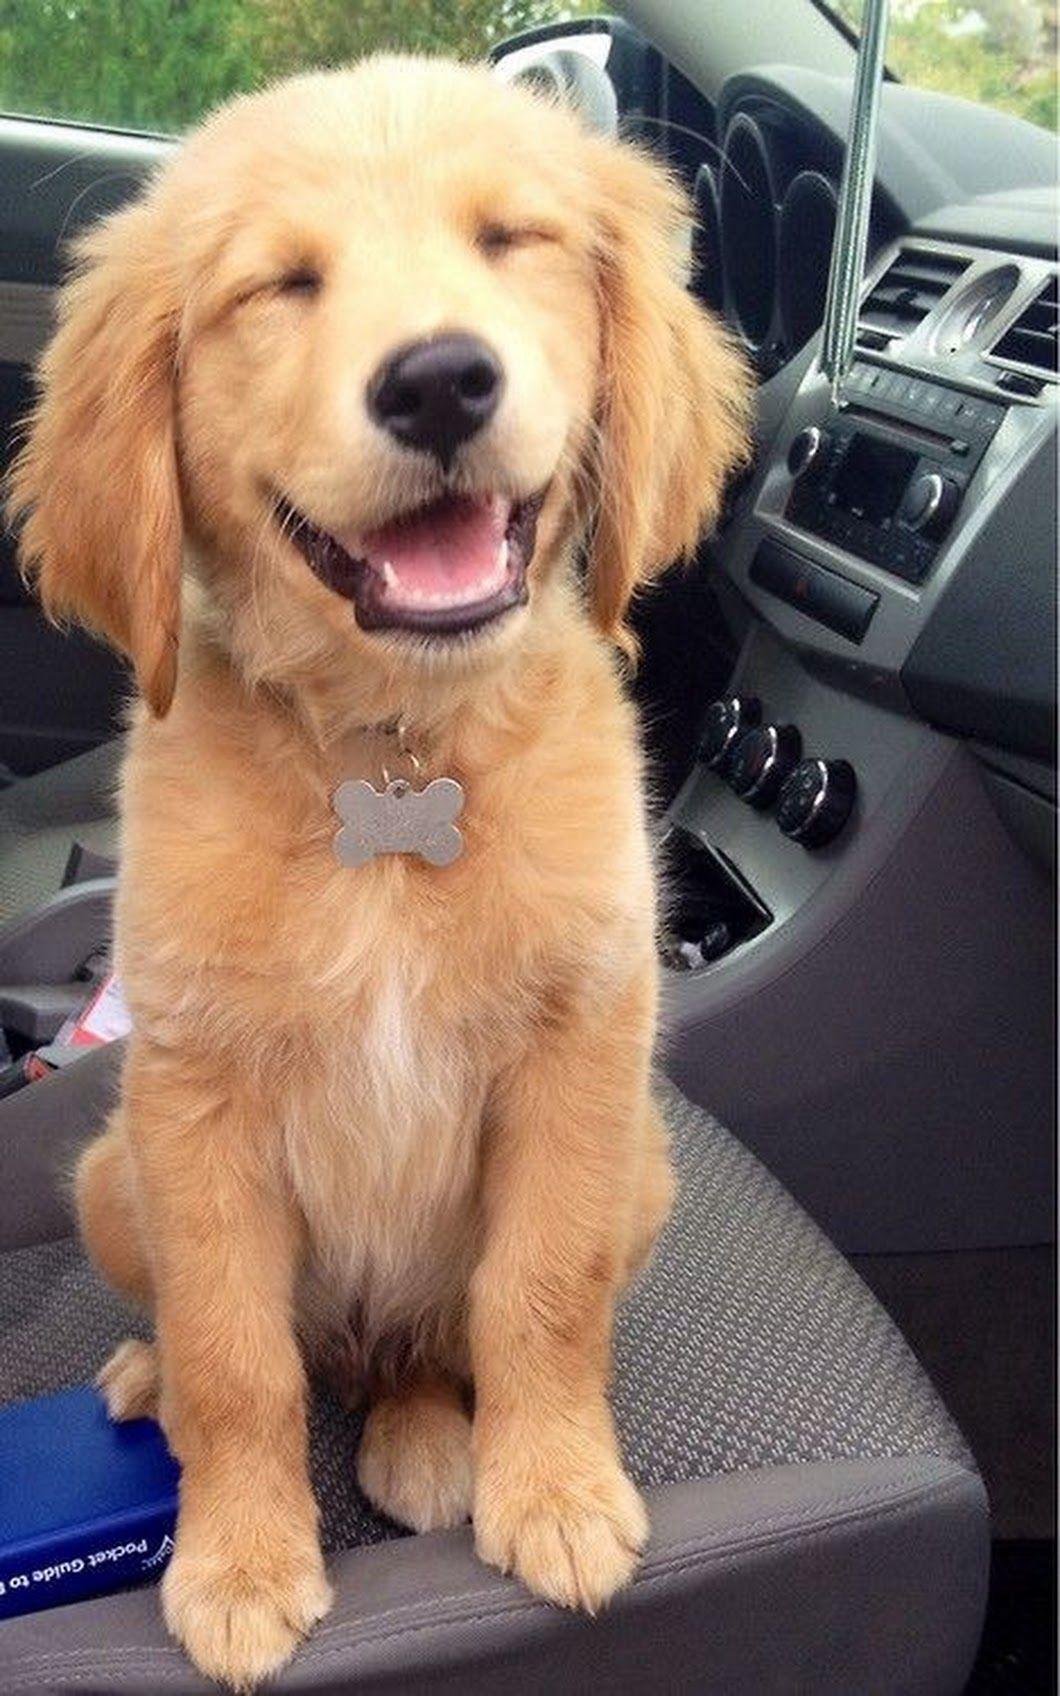 What A Happy Little Puppy Smartest Dog Breeds Cute Animals